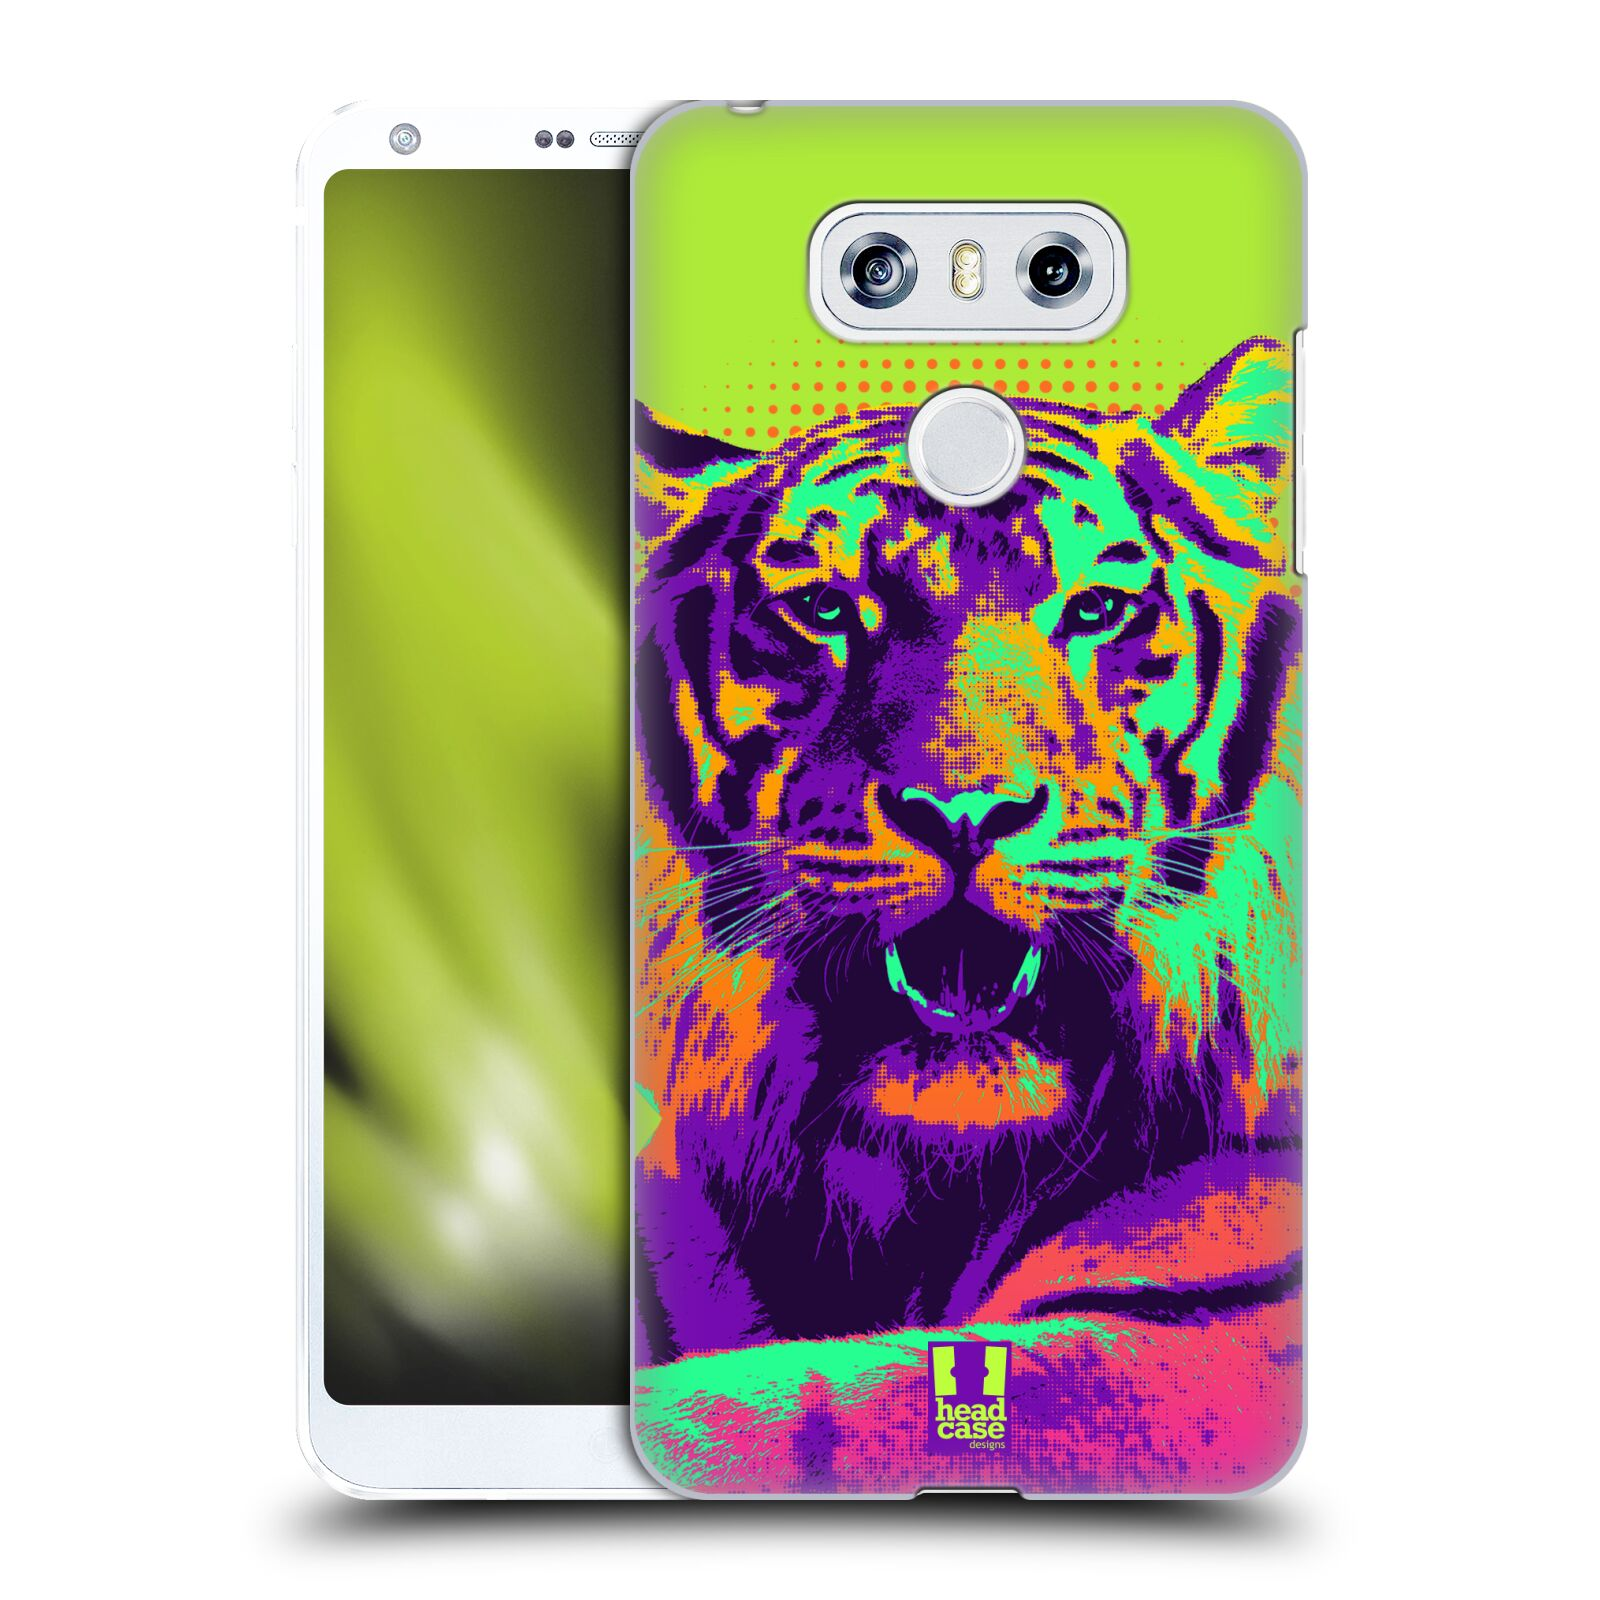 Plastové pouzdro na mobil LG G6 - Head Case POP PRINT TYGR (Plastový kryt či obal na mobilní telefon LG G6 H870 / LG G6 Dual SIM H870DS)